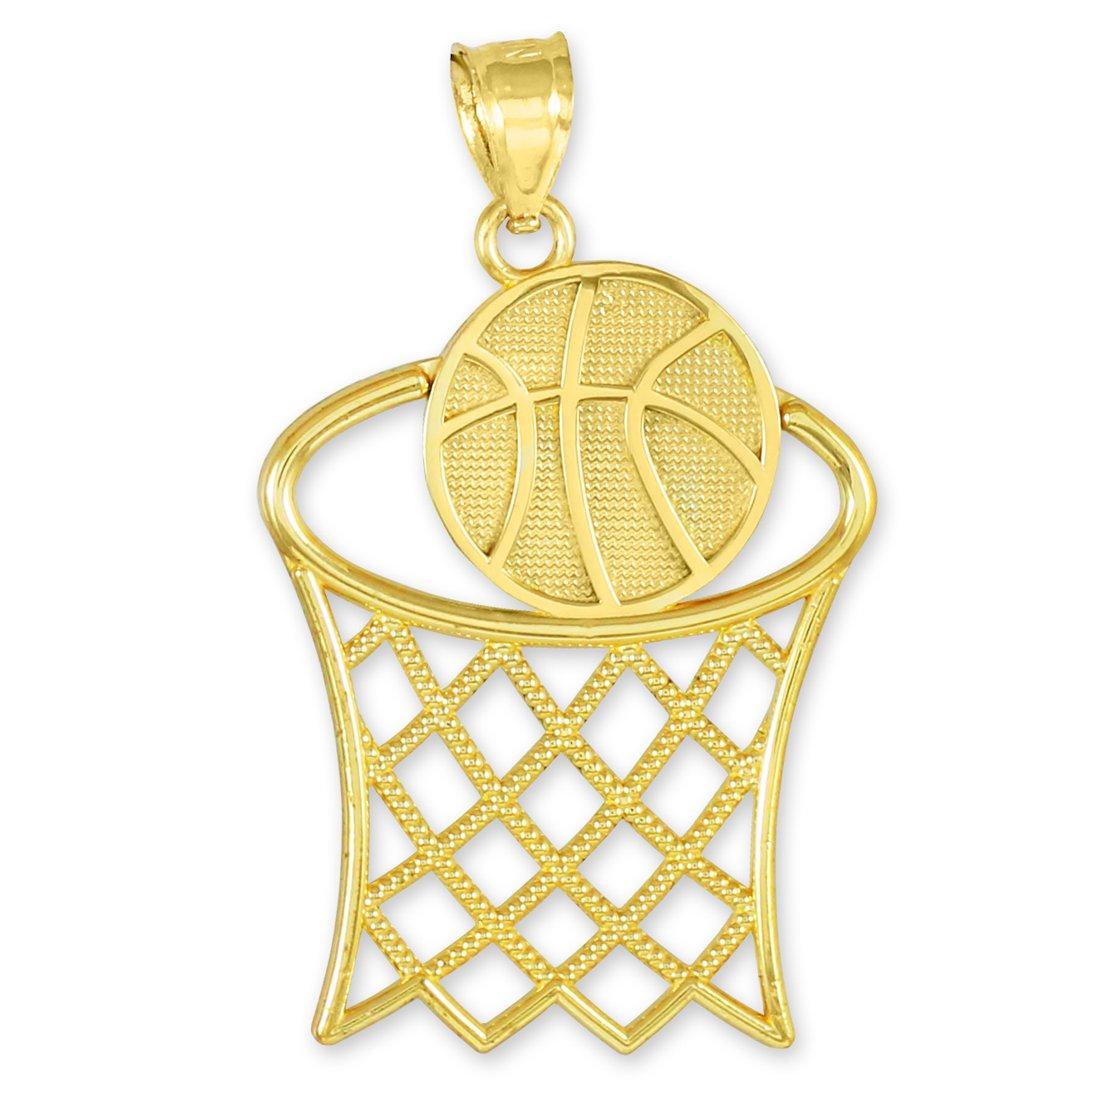 14 quilates 585/1000 Baloncesto Cesta Deportes Oro Colgante collar ...